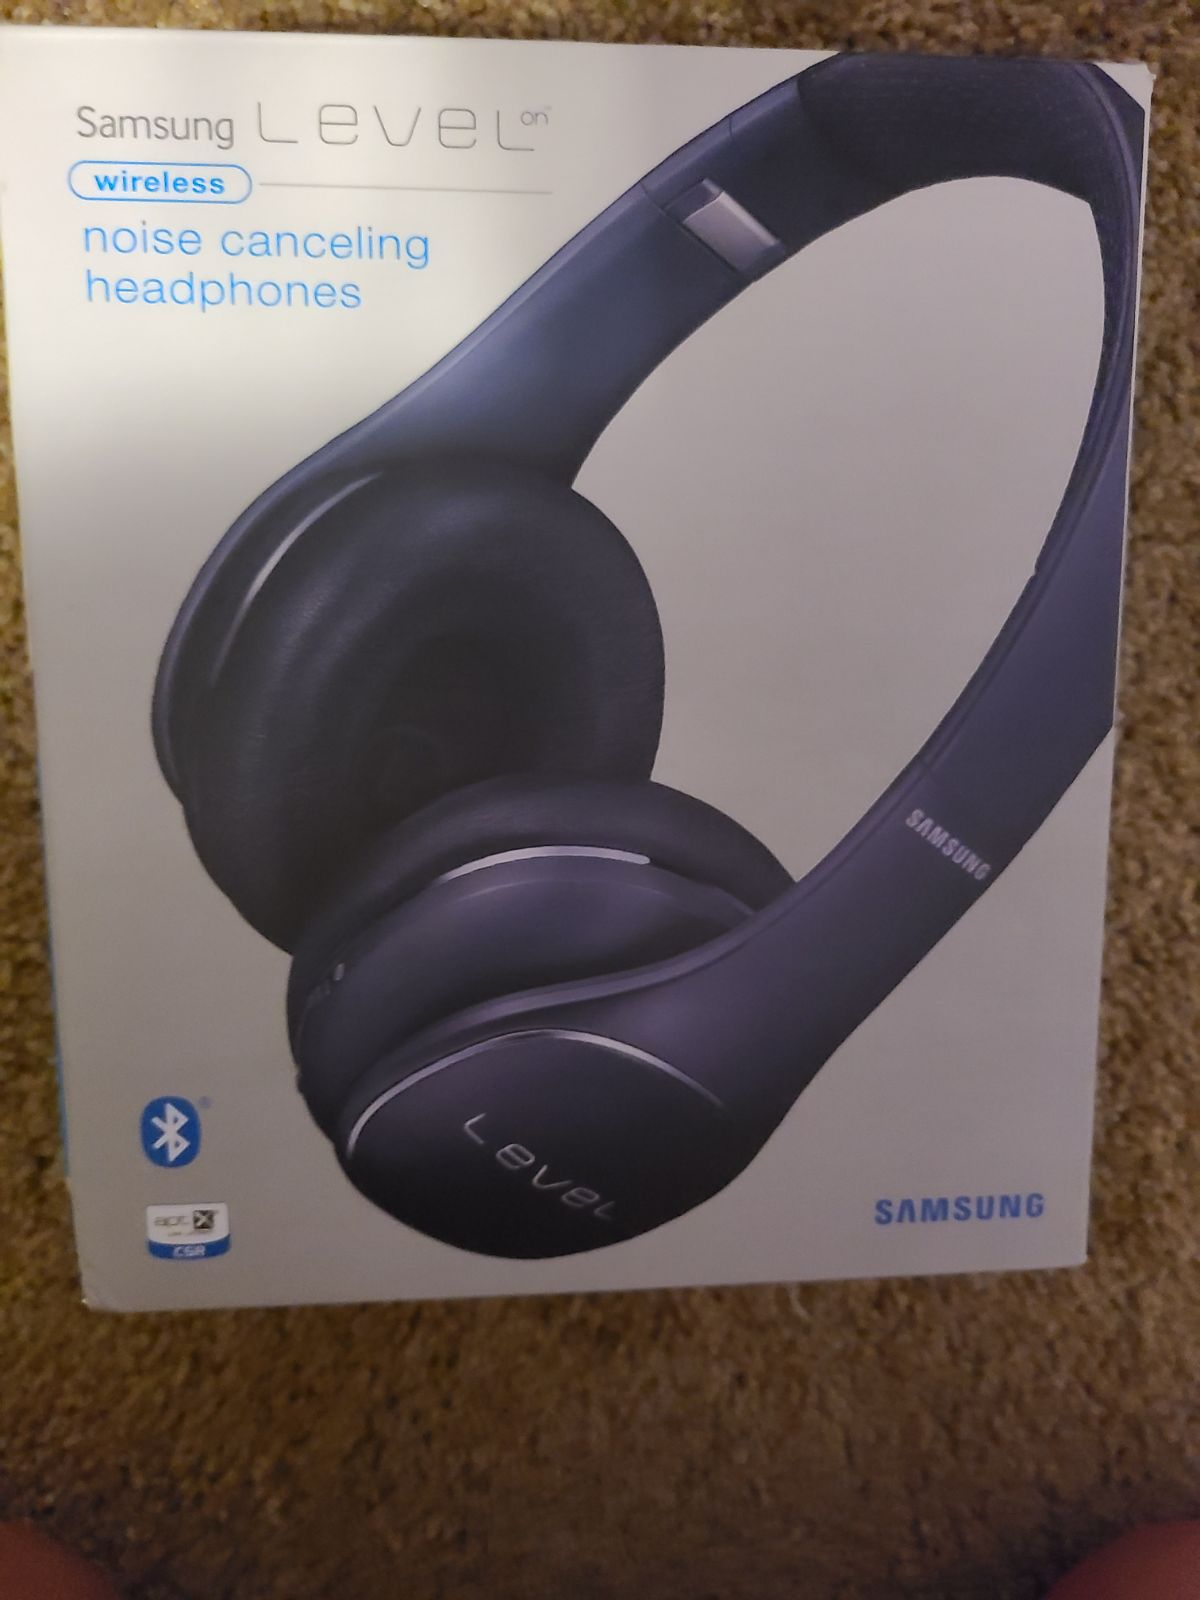 Samsung wireless headphones